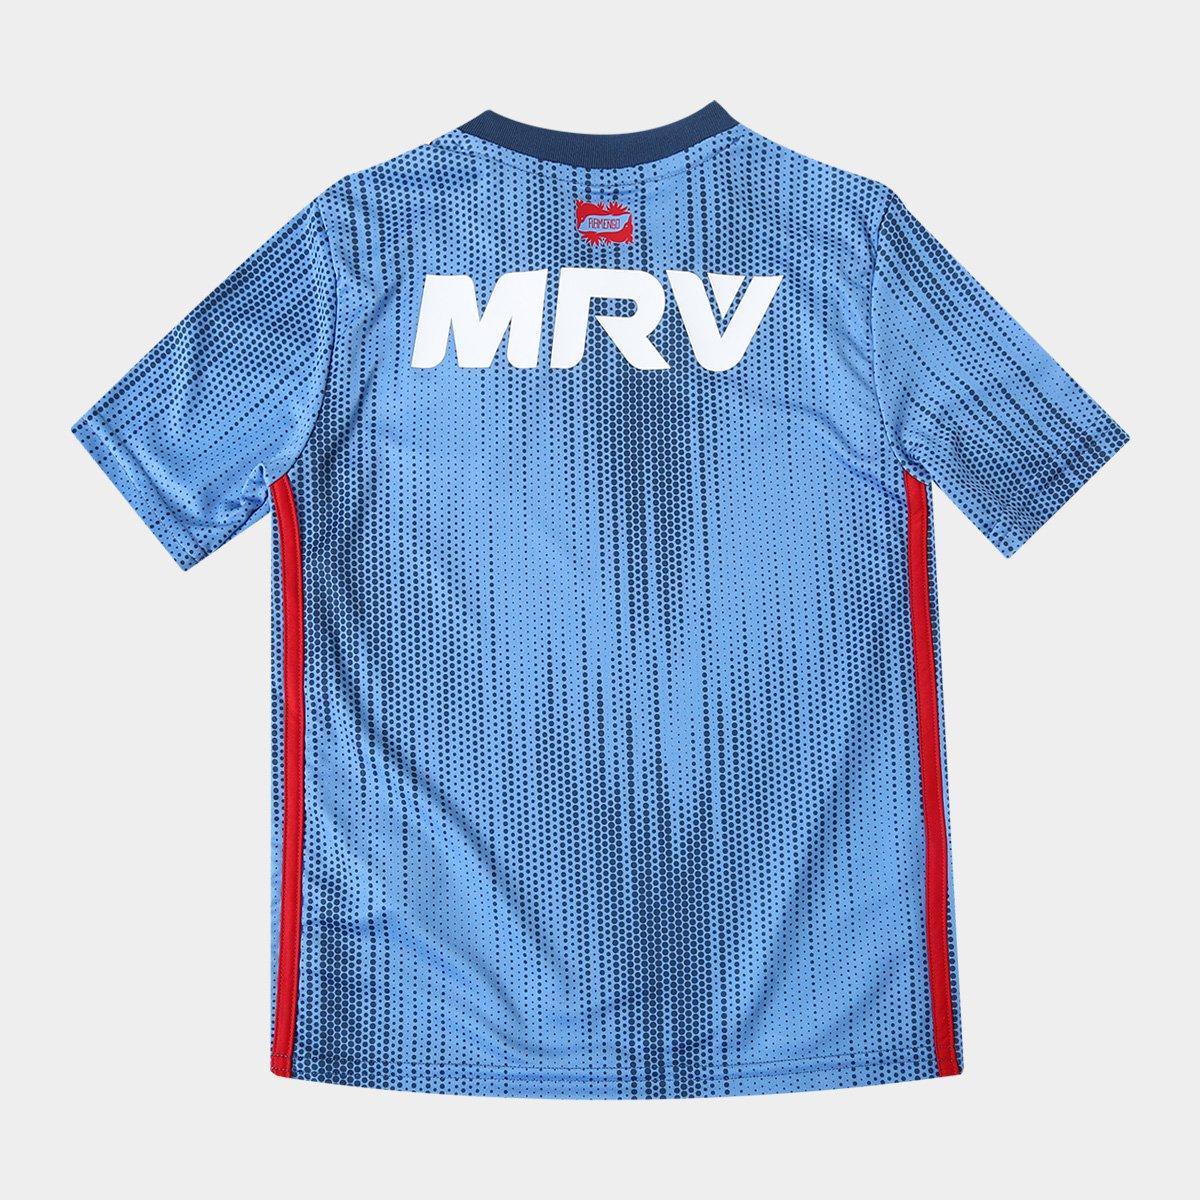 Torcedor Camisa III Adidas n° Azul 2018 Flamengo Infantil s 1vYUvZwq ... d2ef350b8268f